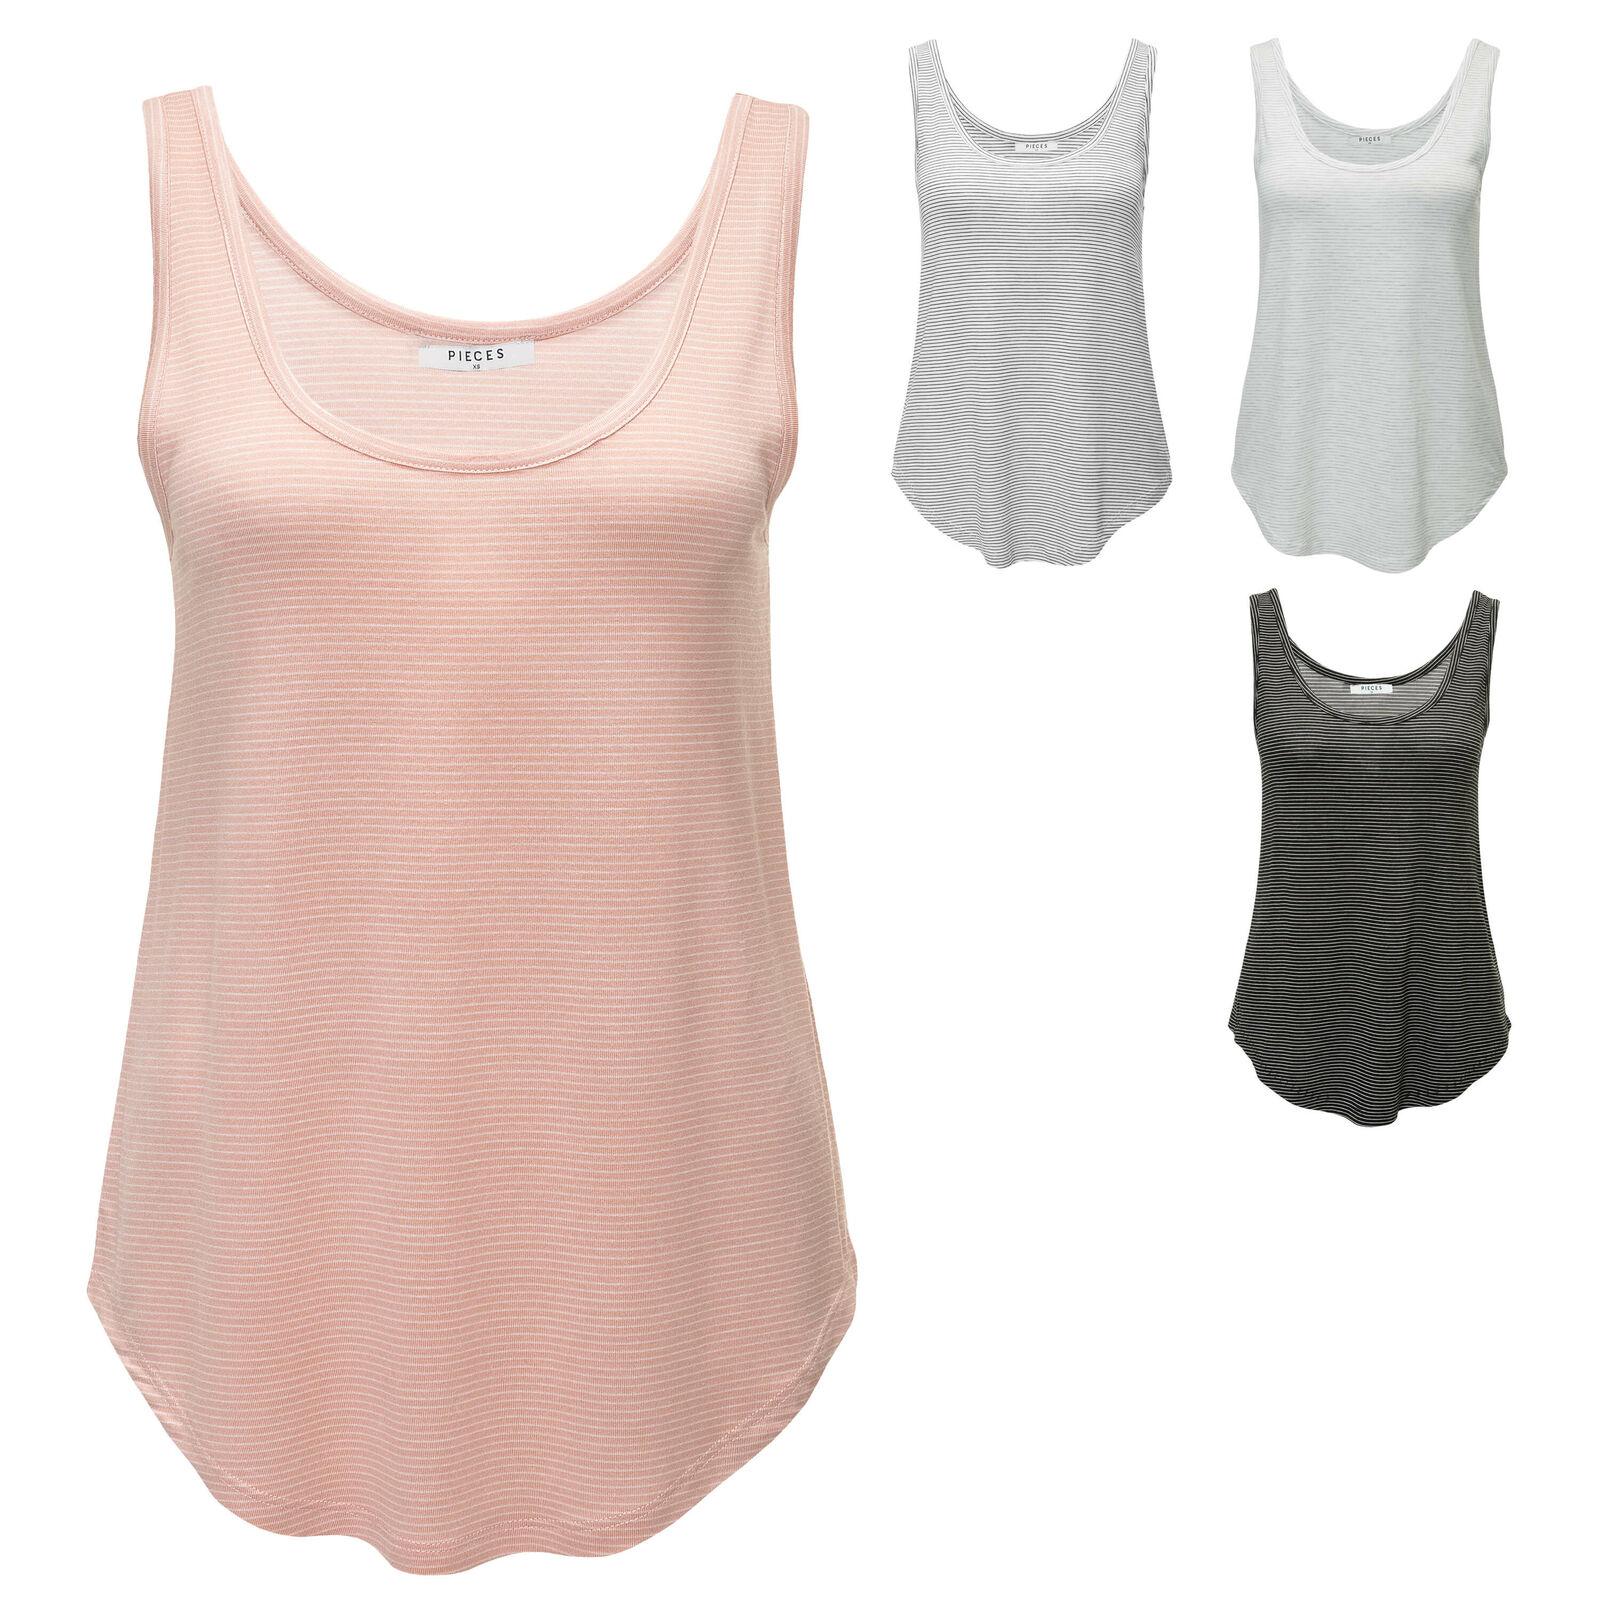 Pieces Damen Tank Top Sommertop Stretch T-Shirt Longtop Longshirt SALE %